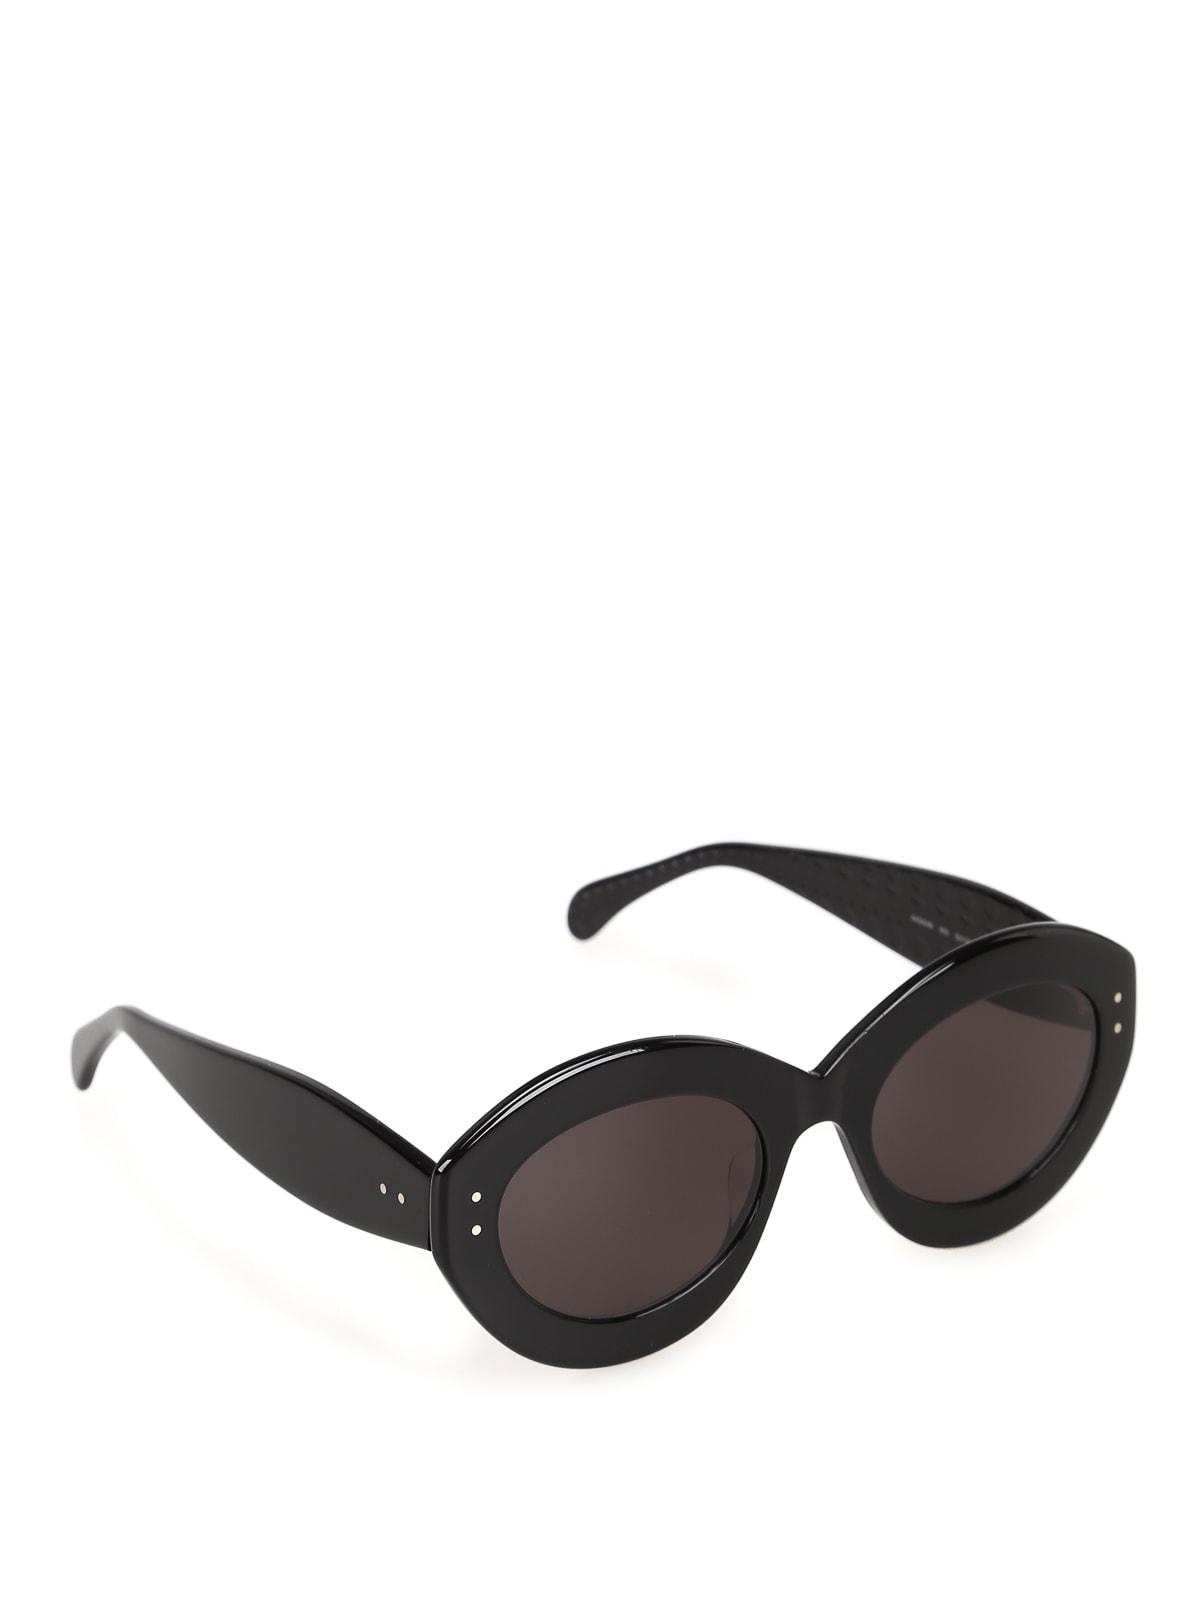 Alaïa Aa0004s Sunglasses In Black Black Grey